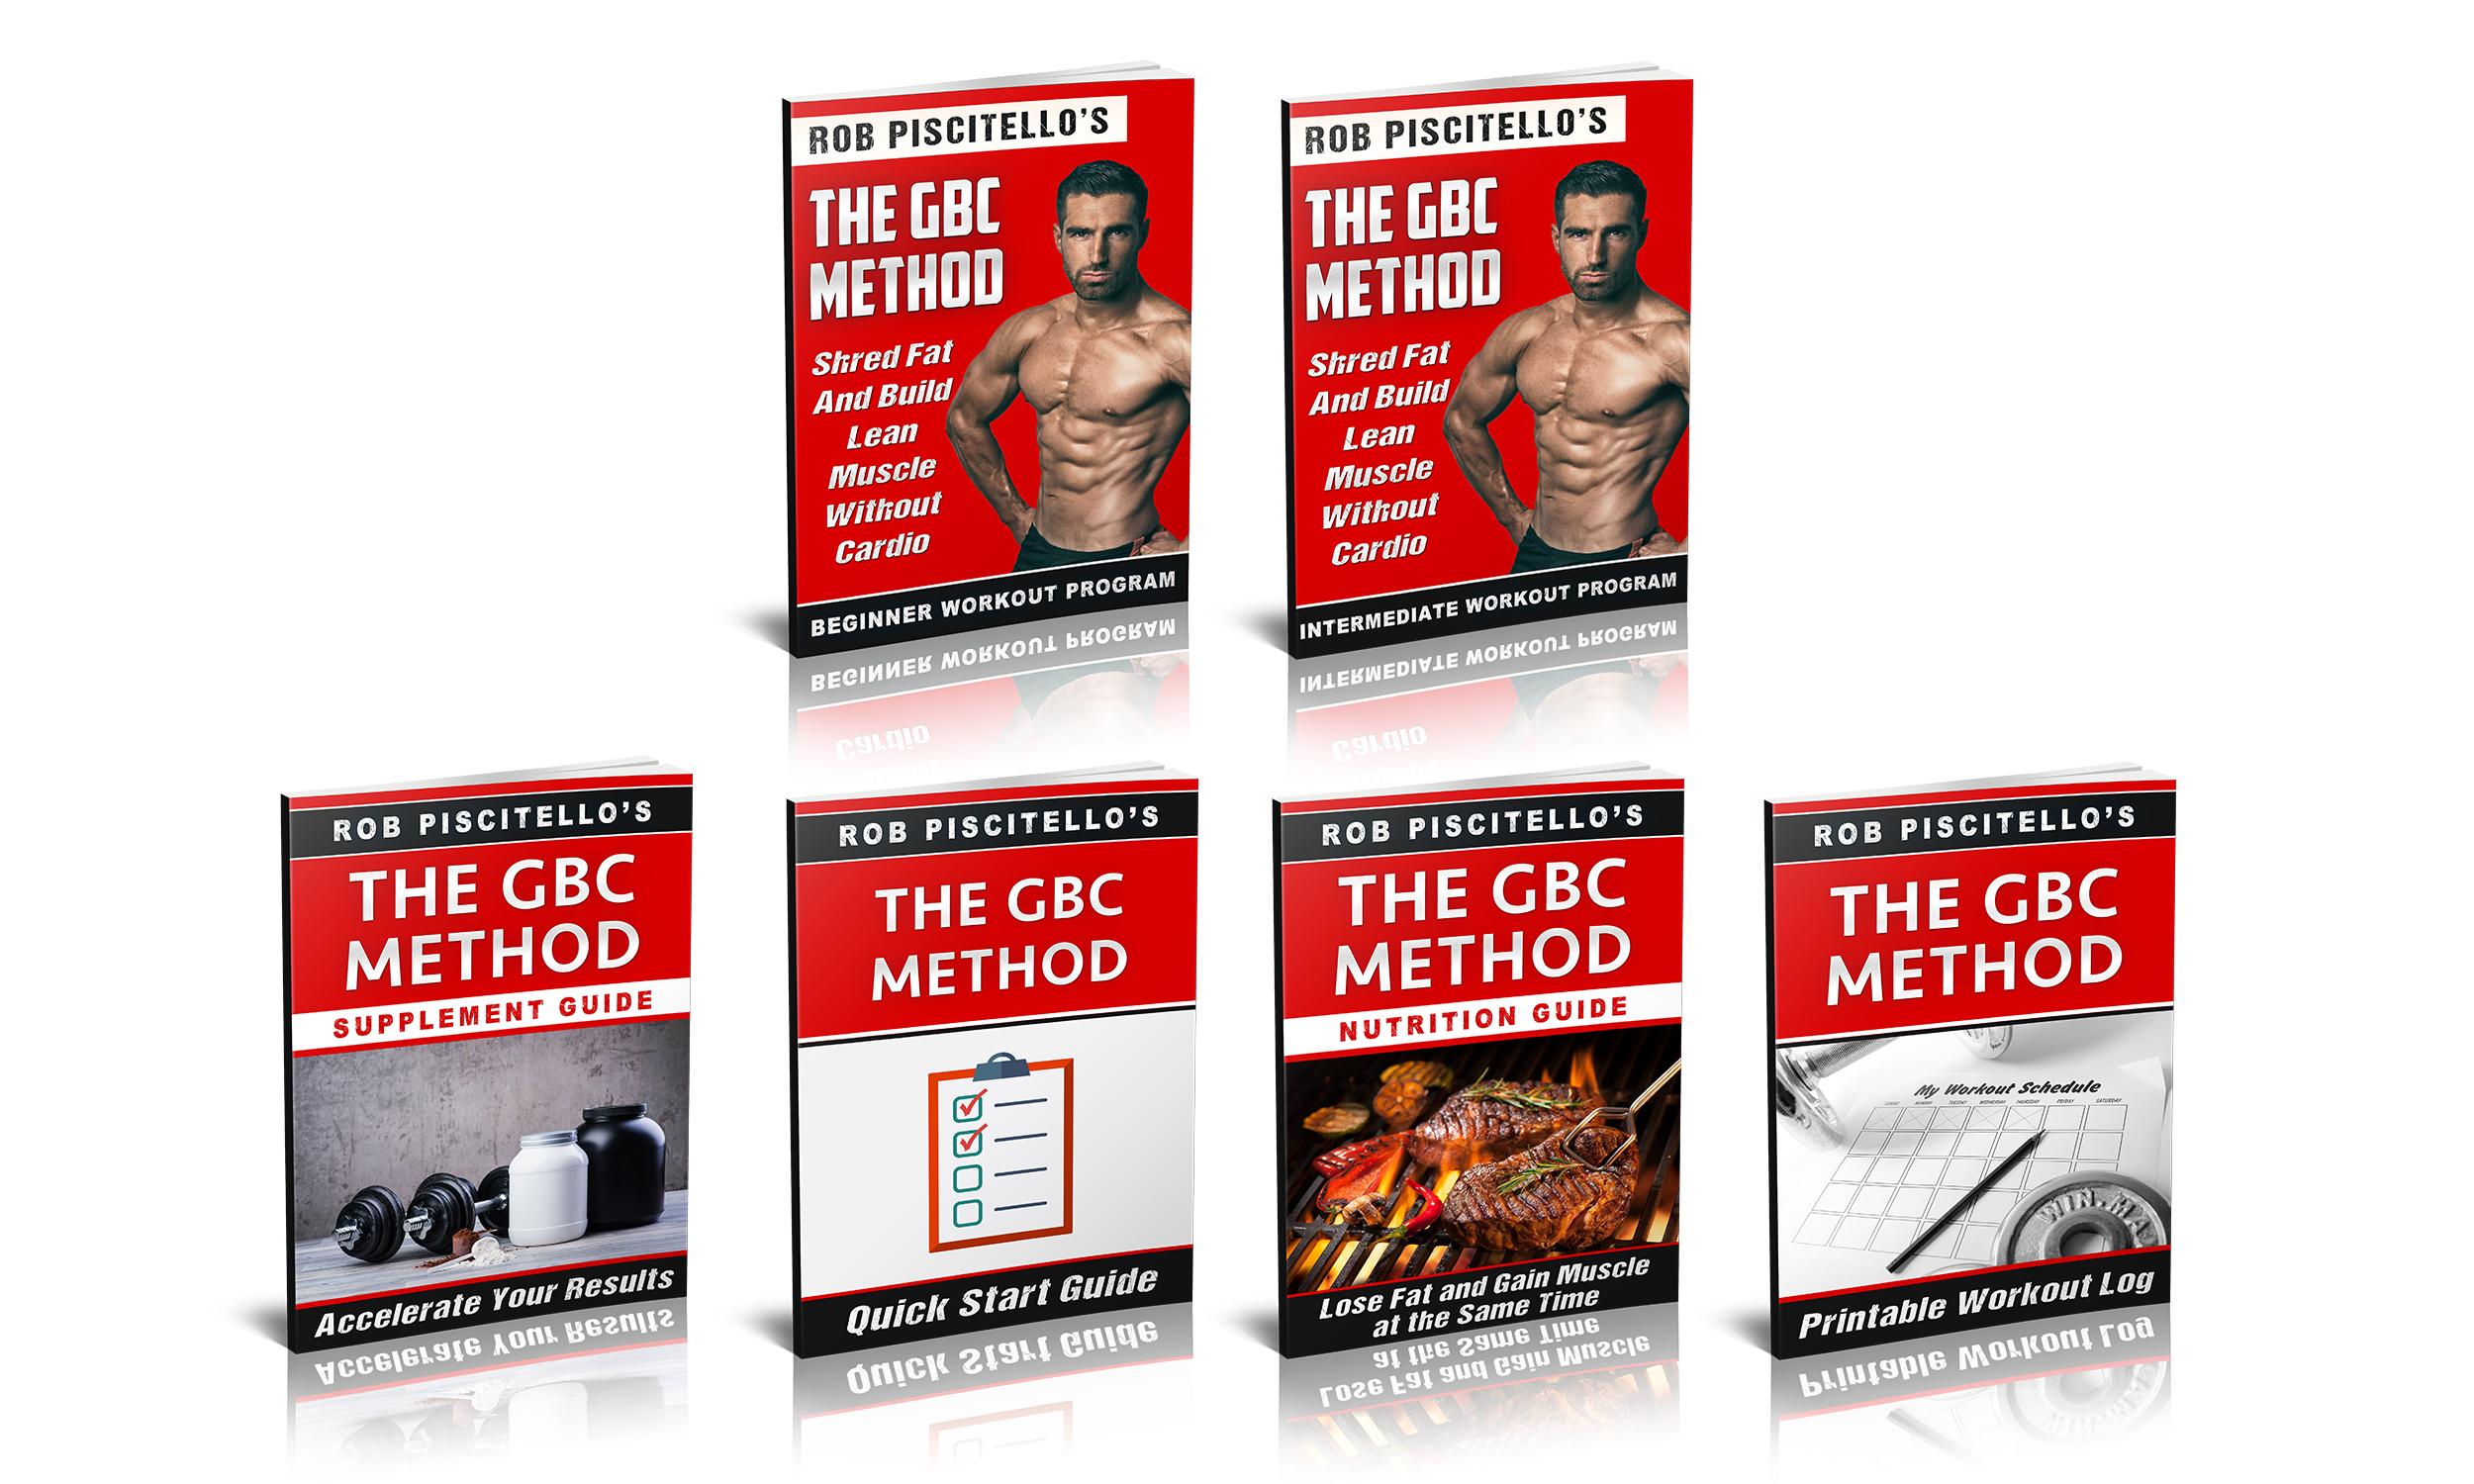 The GBC Method